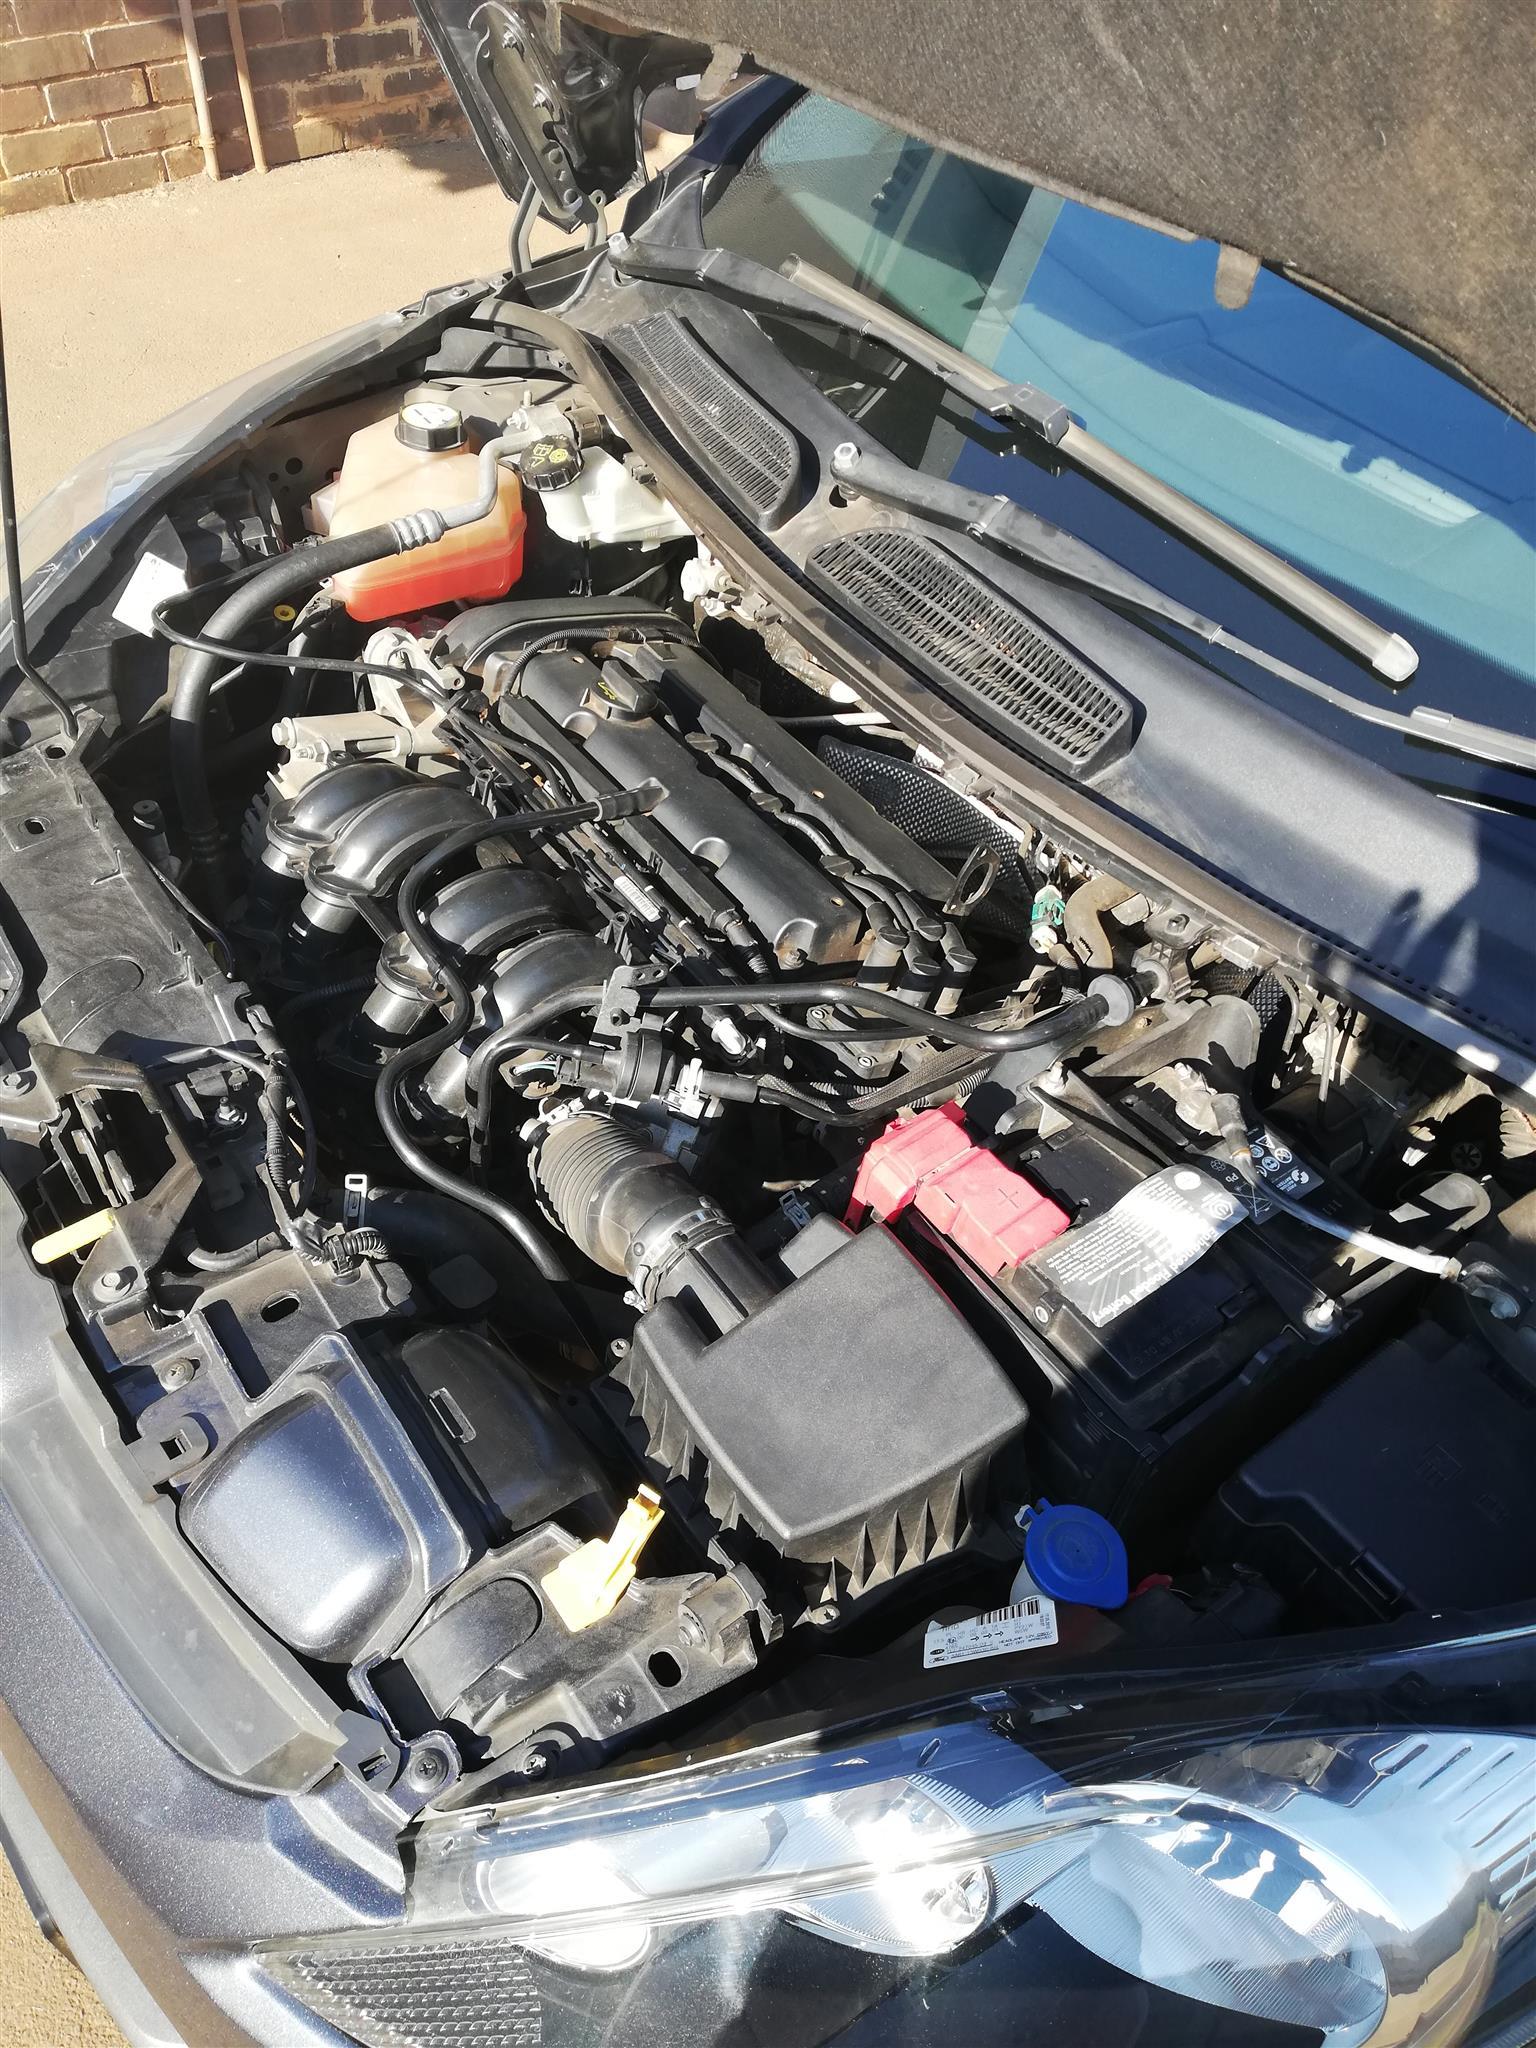 2009 Ford Fiesta 1.4 5 door Ambiente